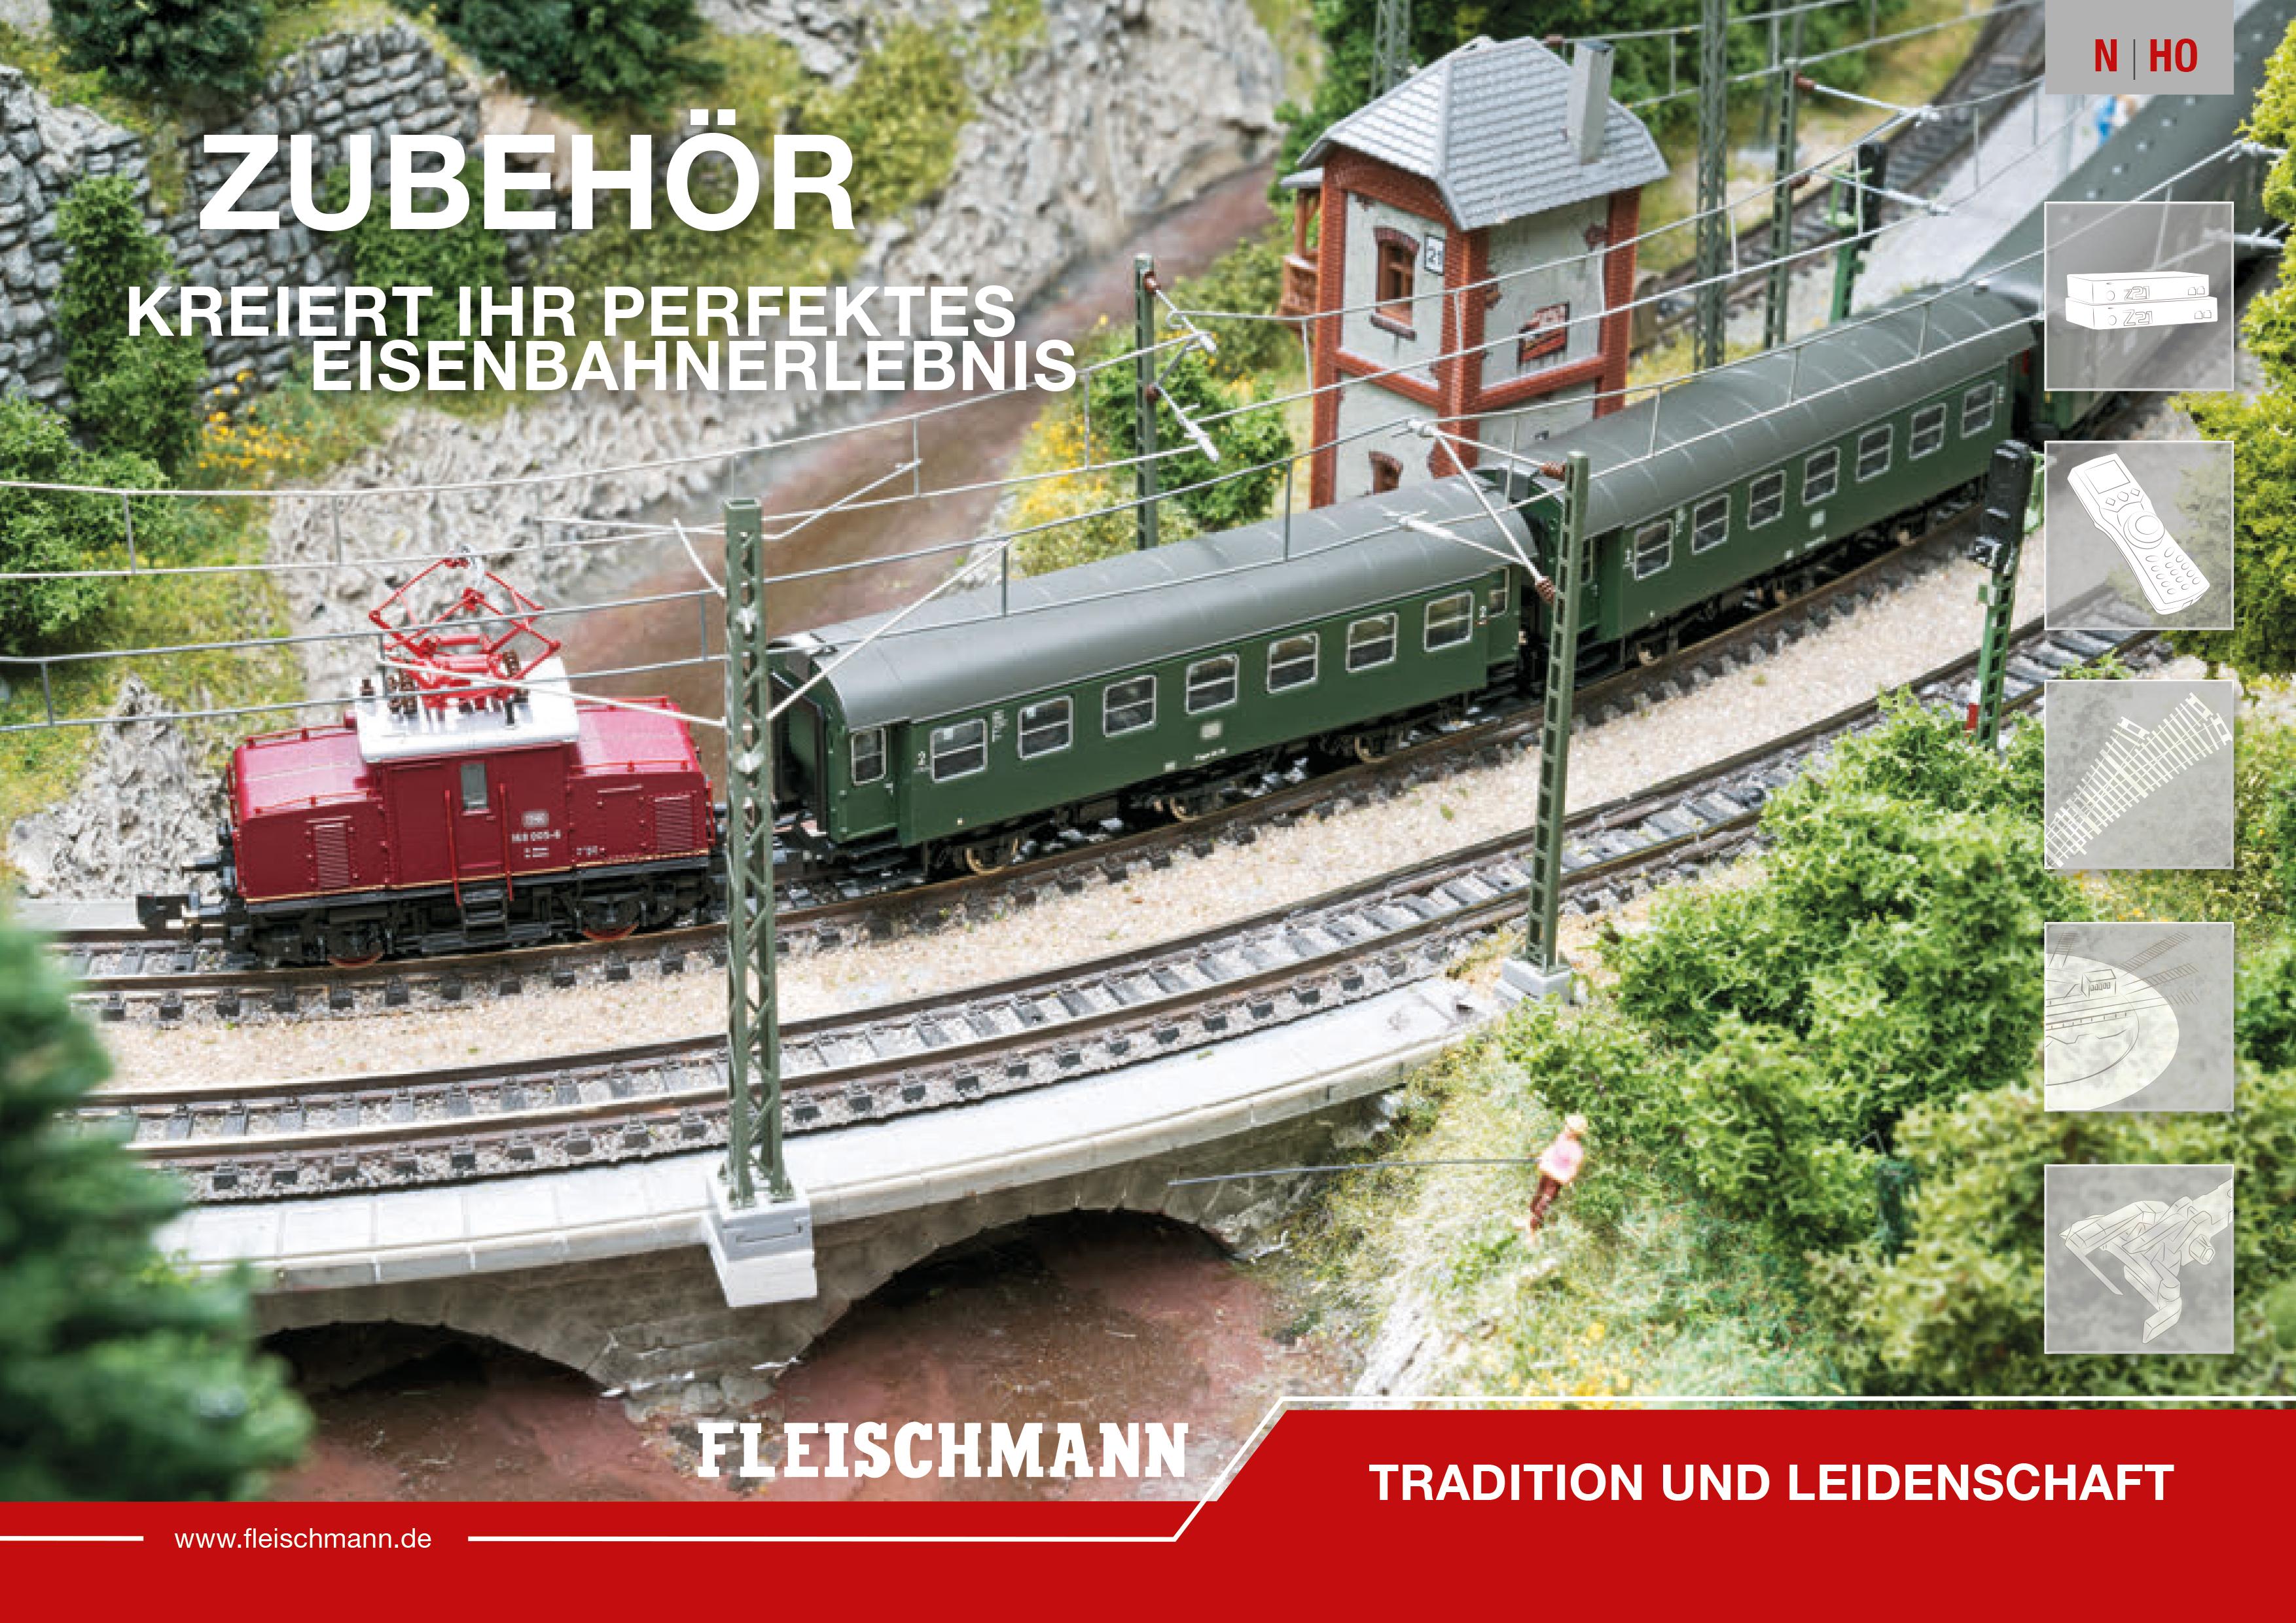 Fleischmann--Zubehoerkatalog-1